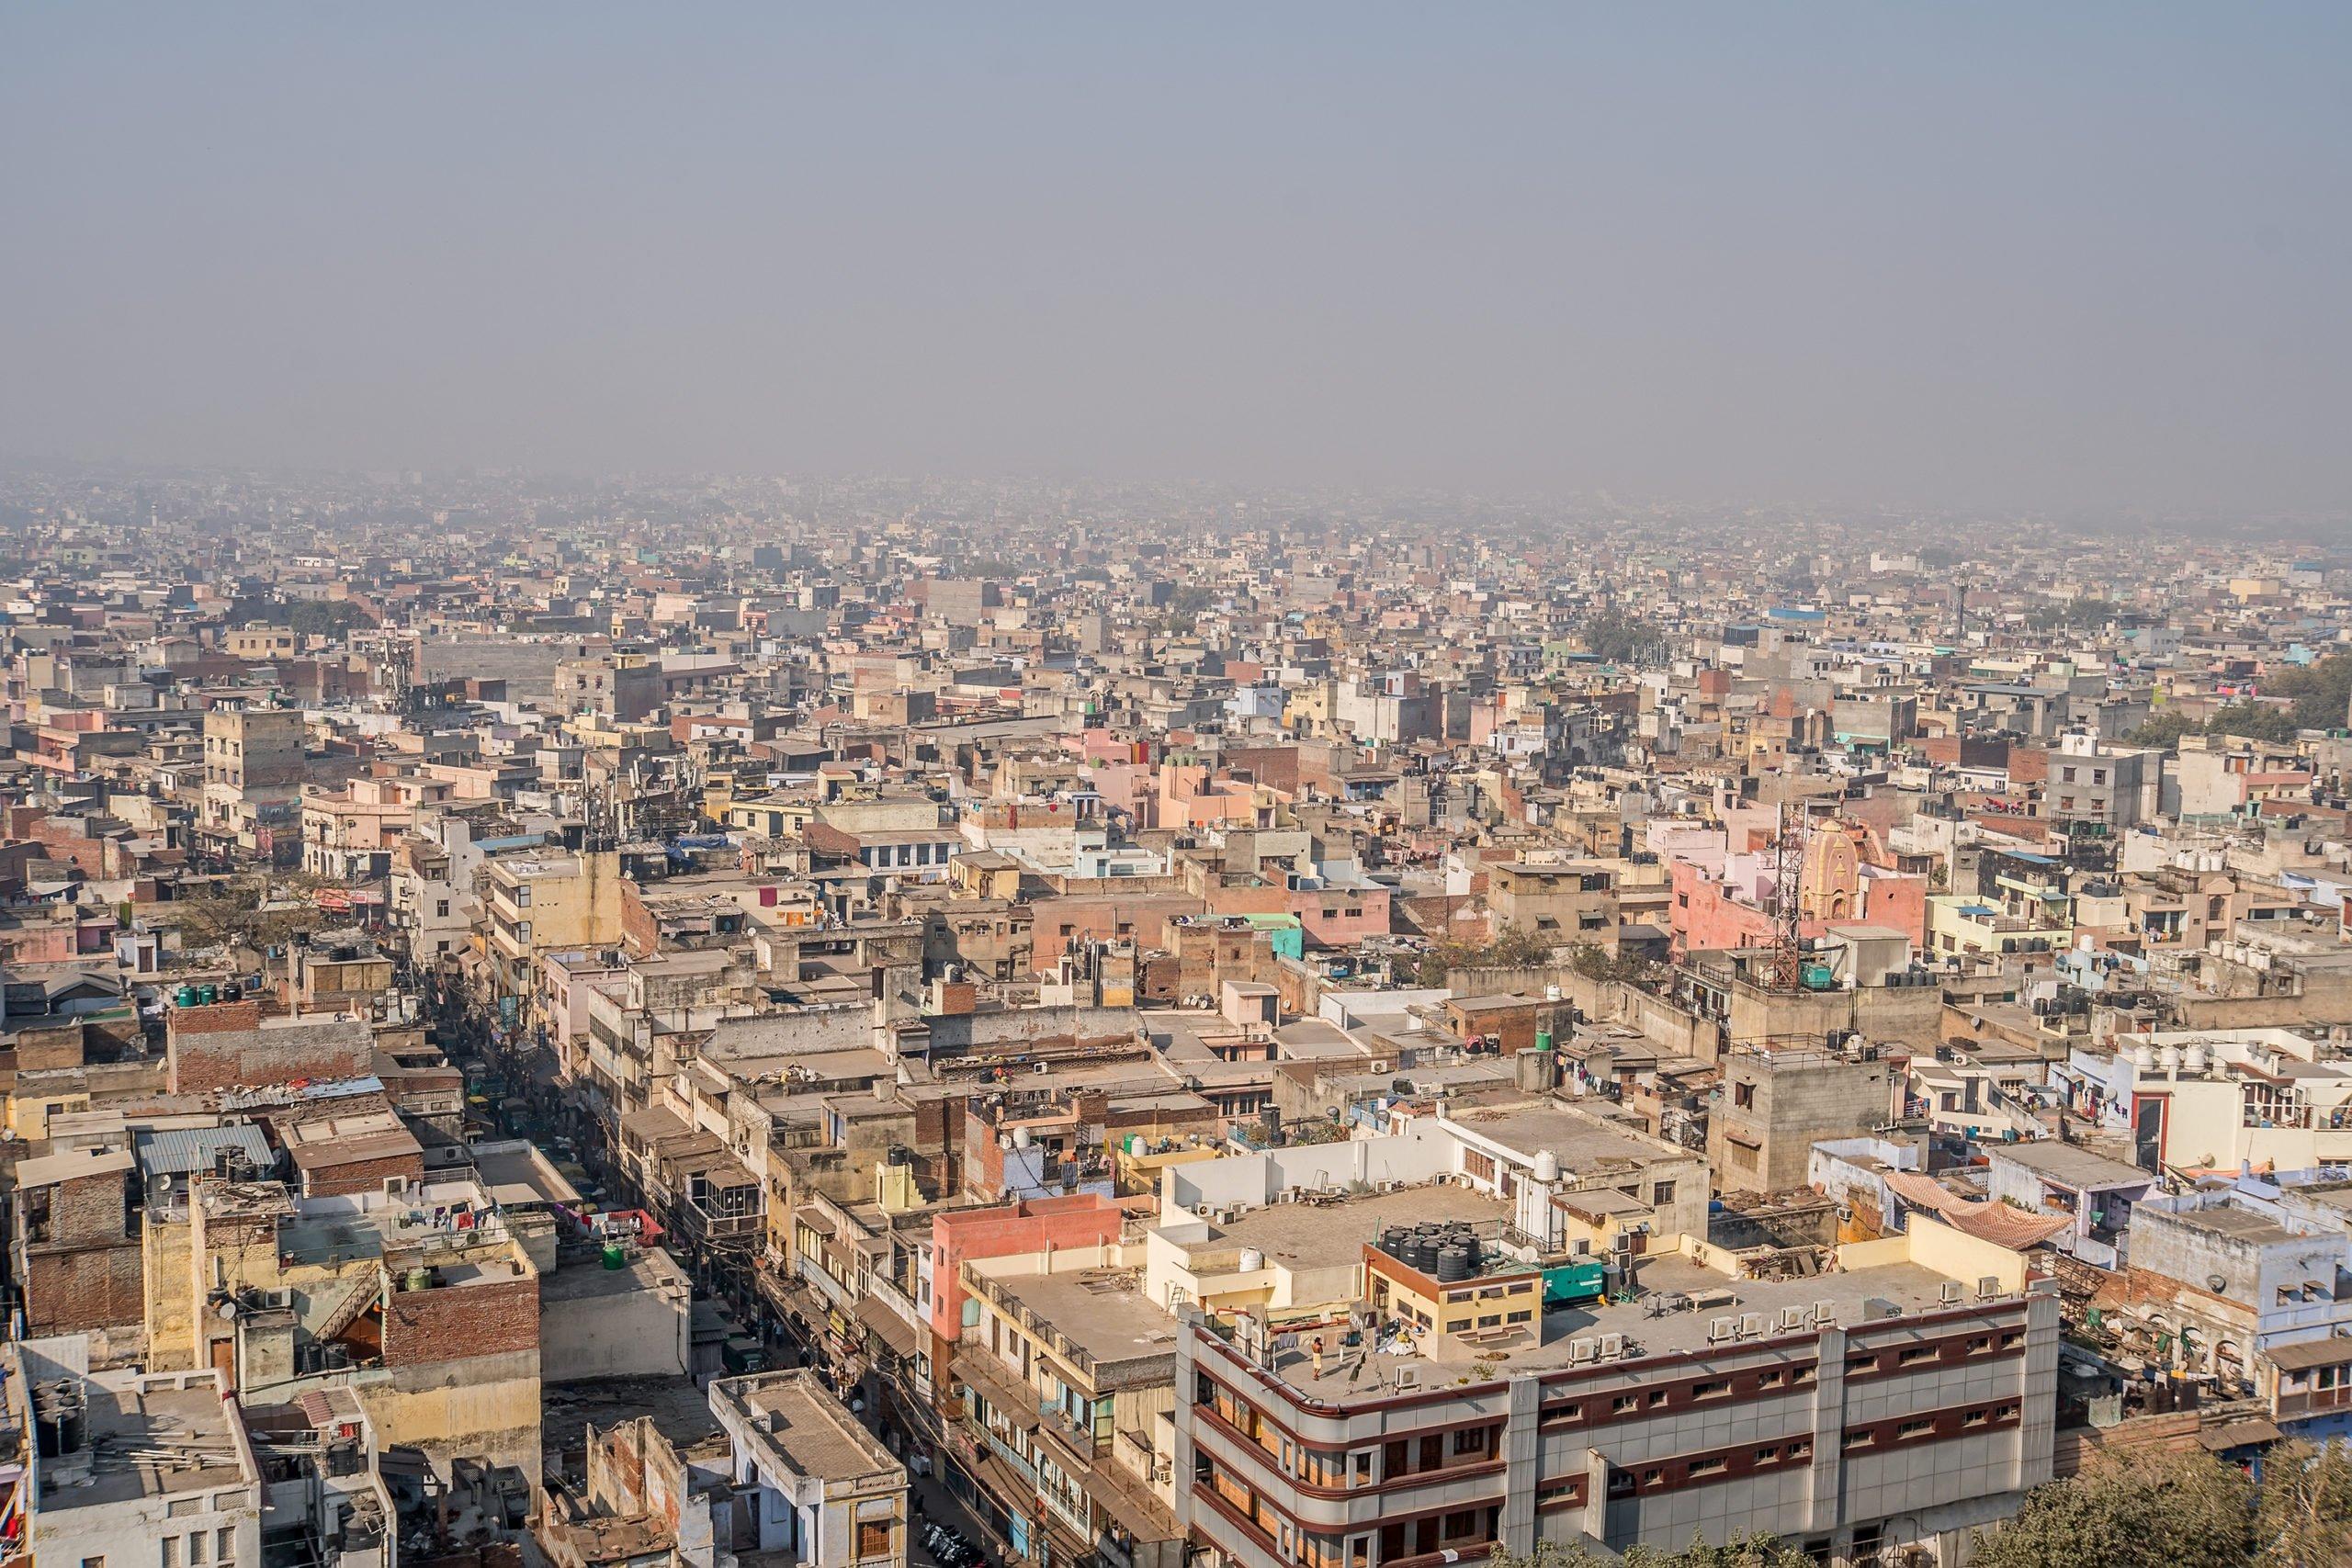 Explore The Inner-city Slum Where Resident Pride Rules Over Poverty In Our Delhi Slum Tour